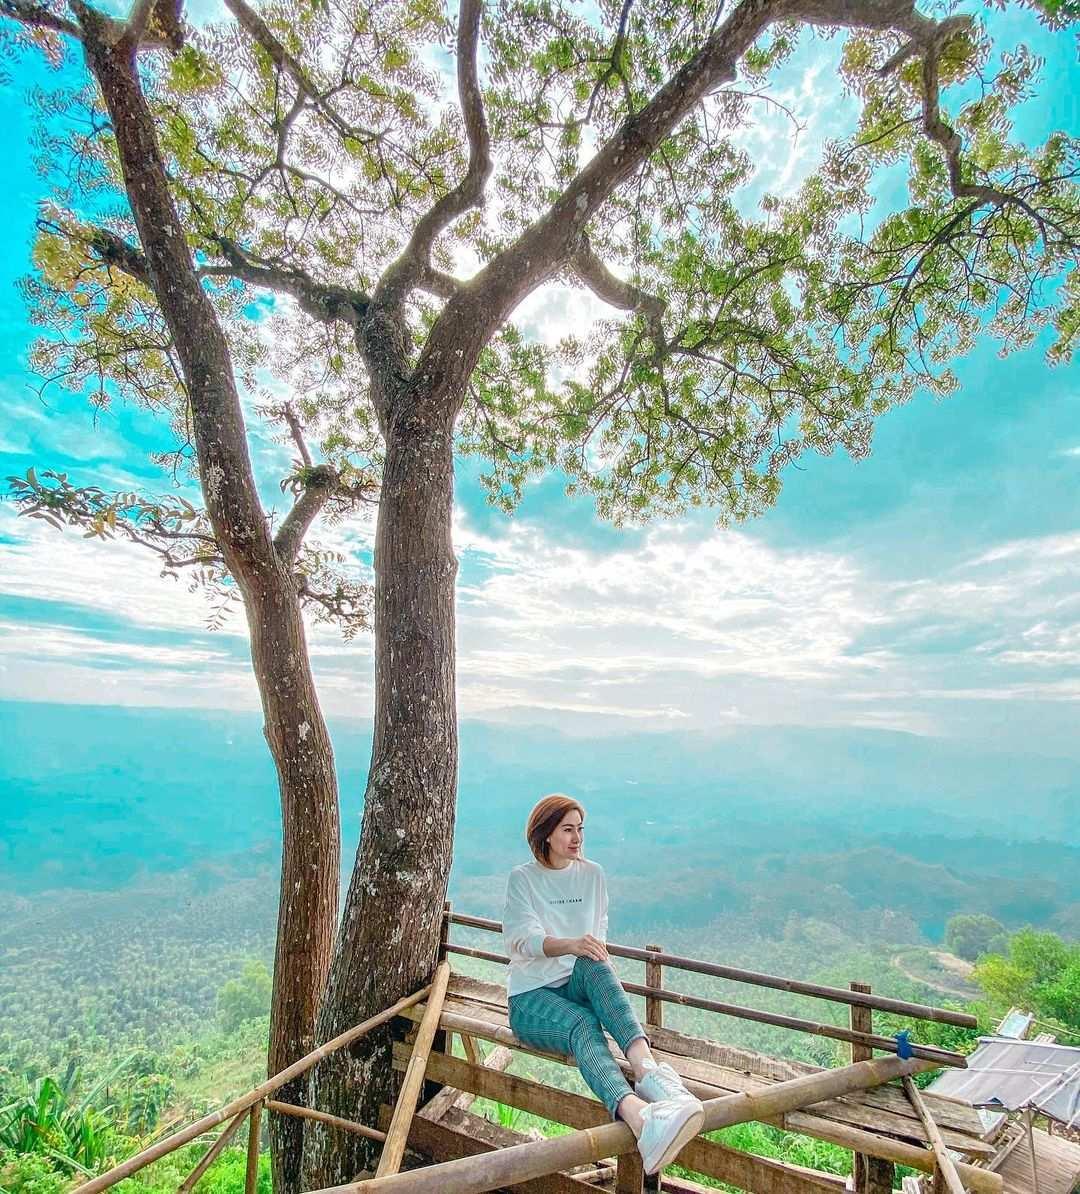 Gardu Pandang di Bukit Puji Ningrum Tasikmalaya Image From @c1ng.fangky